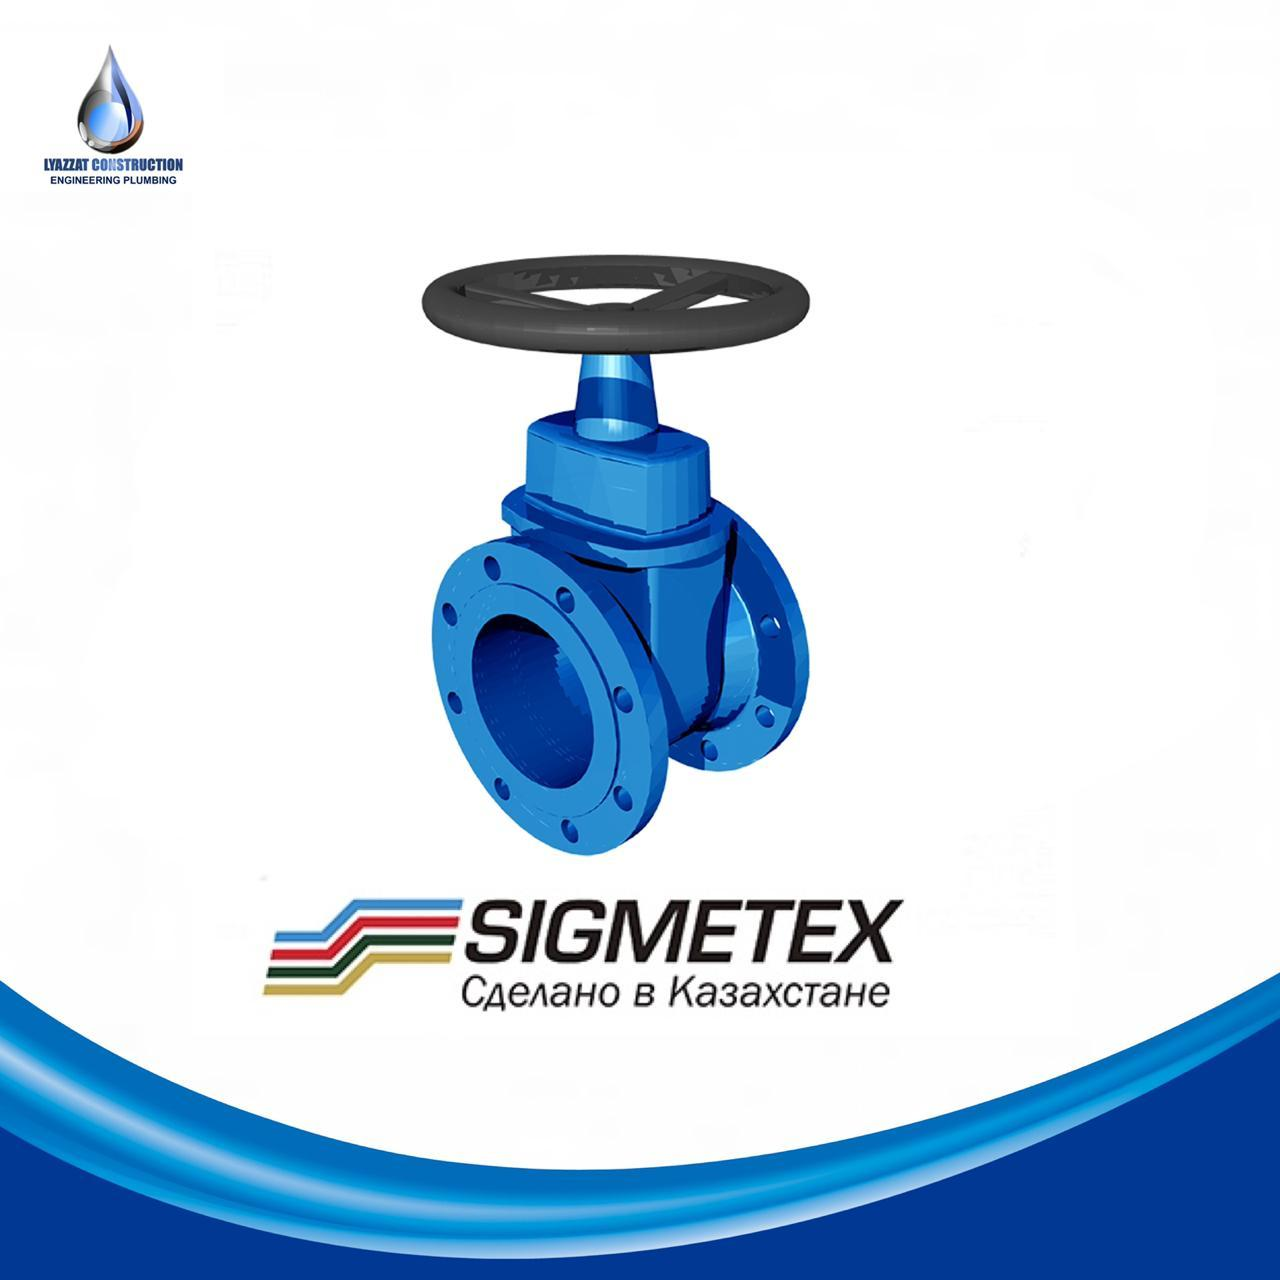 Задвижка Sigmetex DN 500 (Сигметэкс)